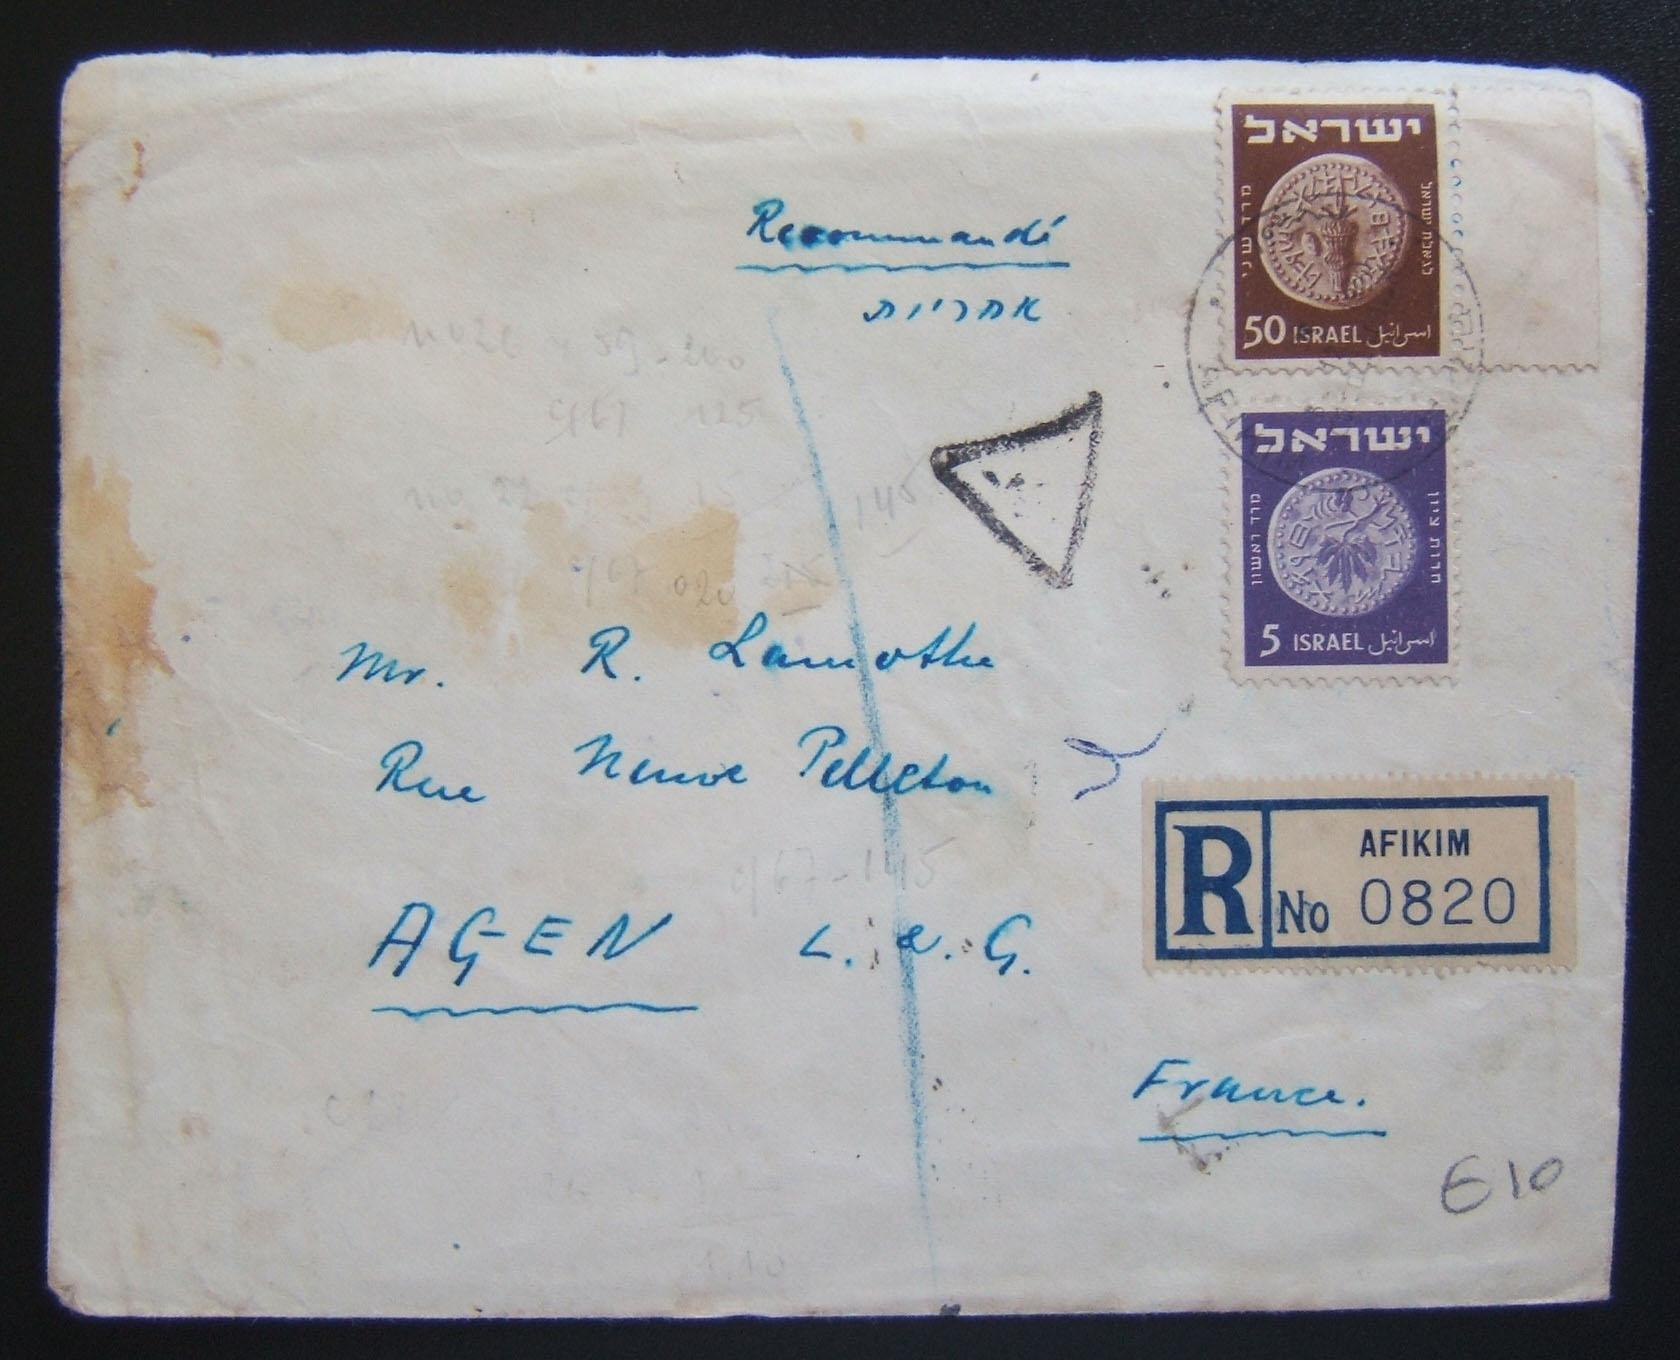 1950 2nd Coinage reg. surface mail: 8-12-1950 reg. comm cv ex AFIKIM to FRANCE franked 55pr per SU-2 period rate (30pr letter + 25pr reg fee) using 5pr & 50pr Ba22/26, tied by sing